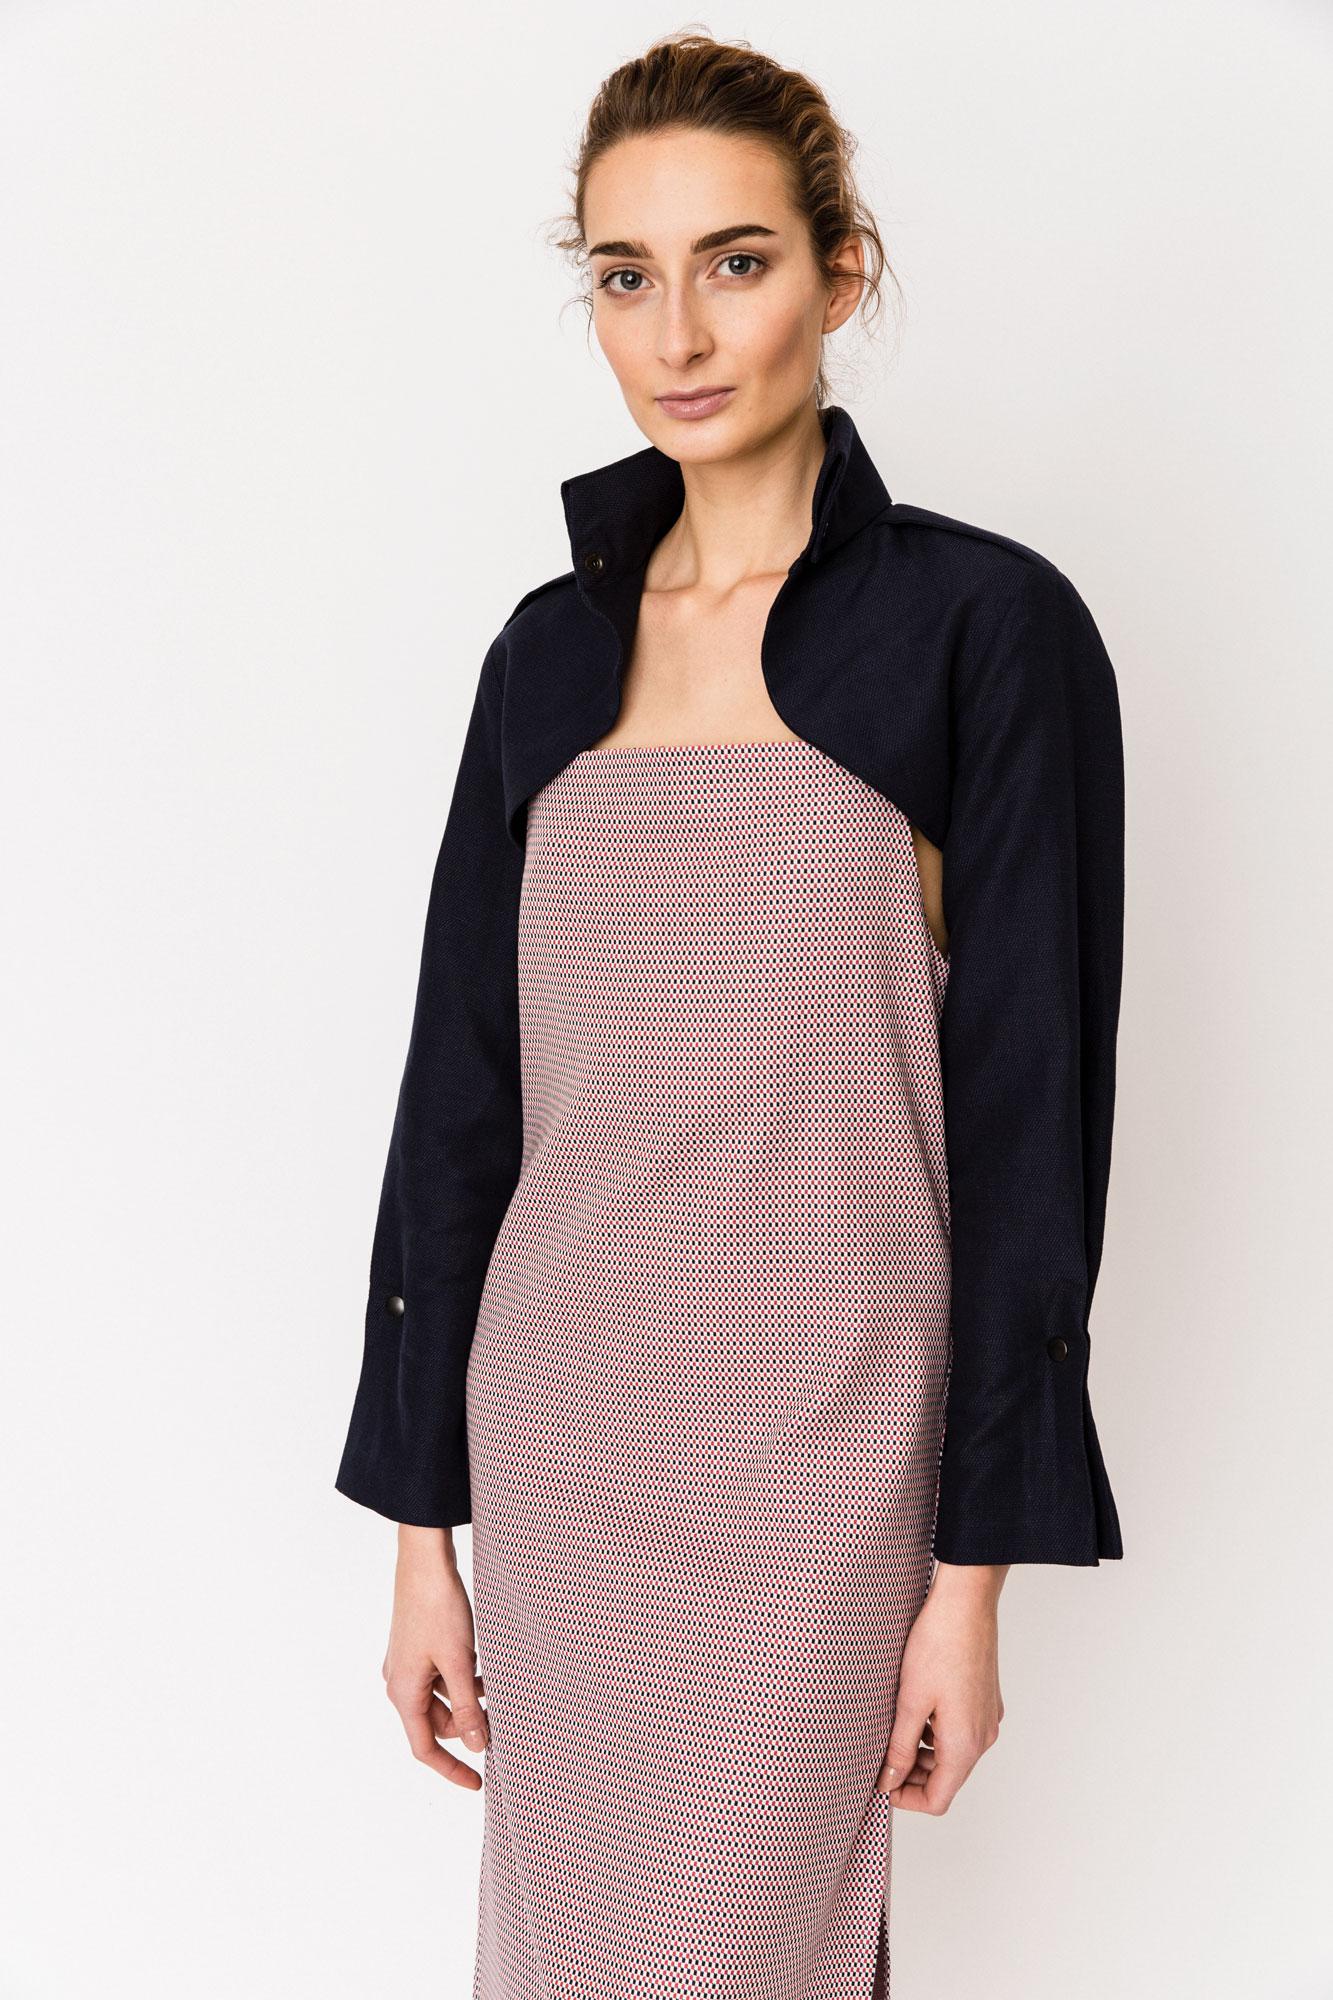 S18-04Inspect_Dress6